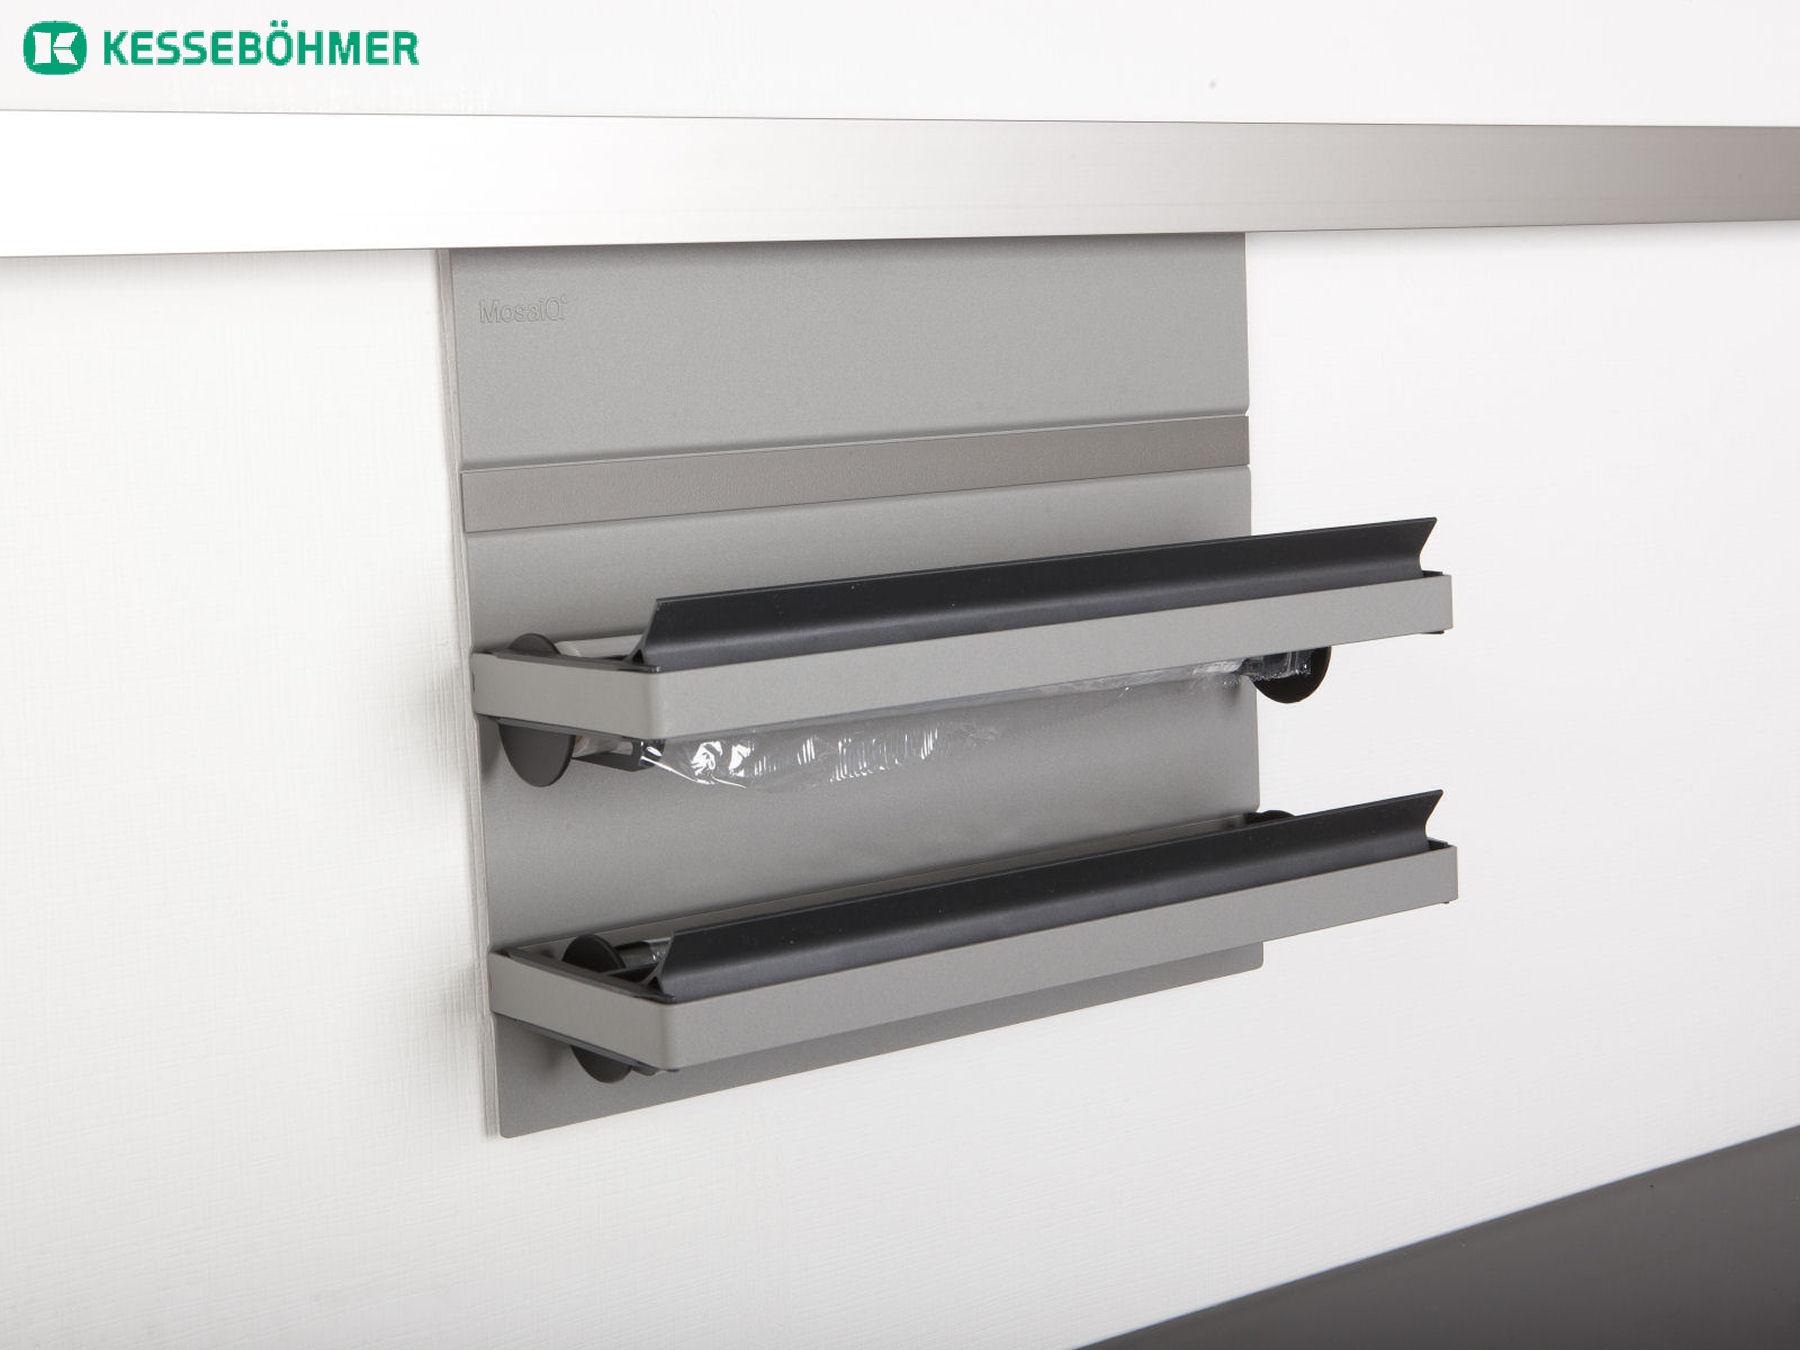 kesseb hmer linero mosaiq 600 1800 mm titangrau relingsystem k chenreling ebay. Black Bedroom Furniture Sets. Home Design Ideas